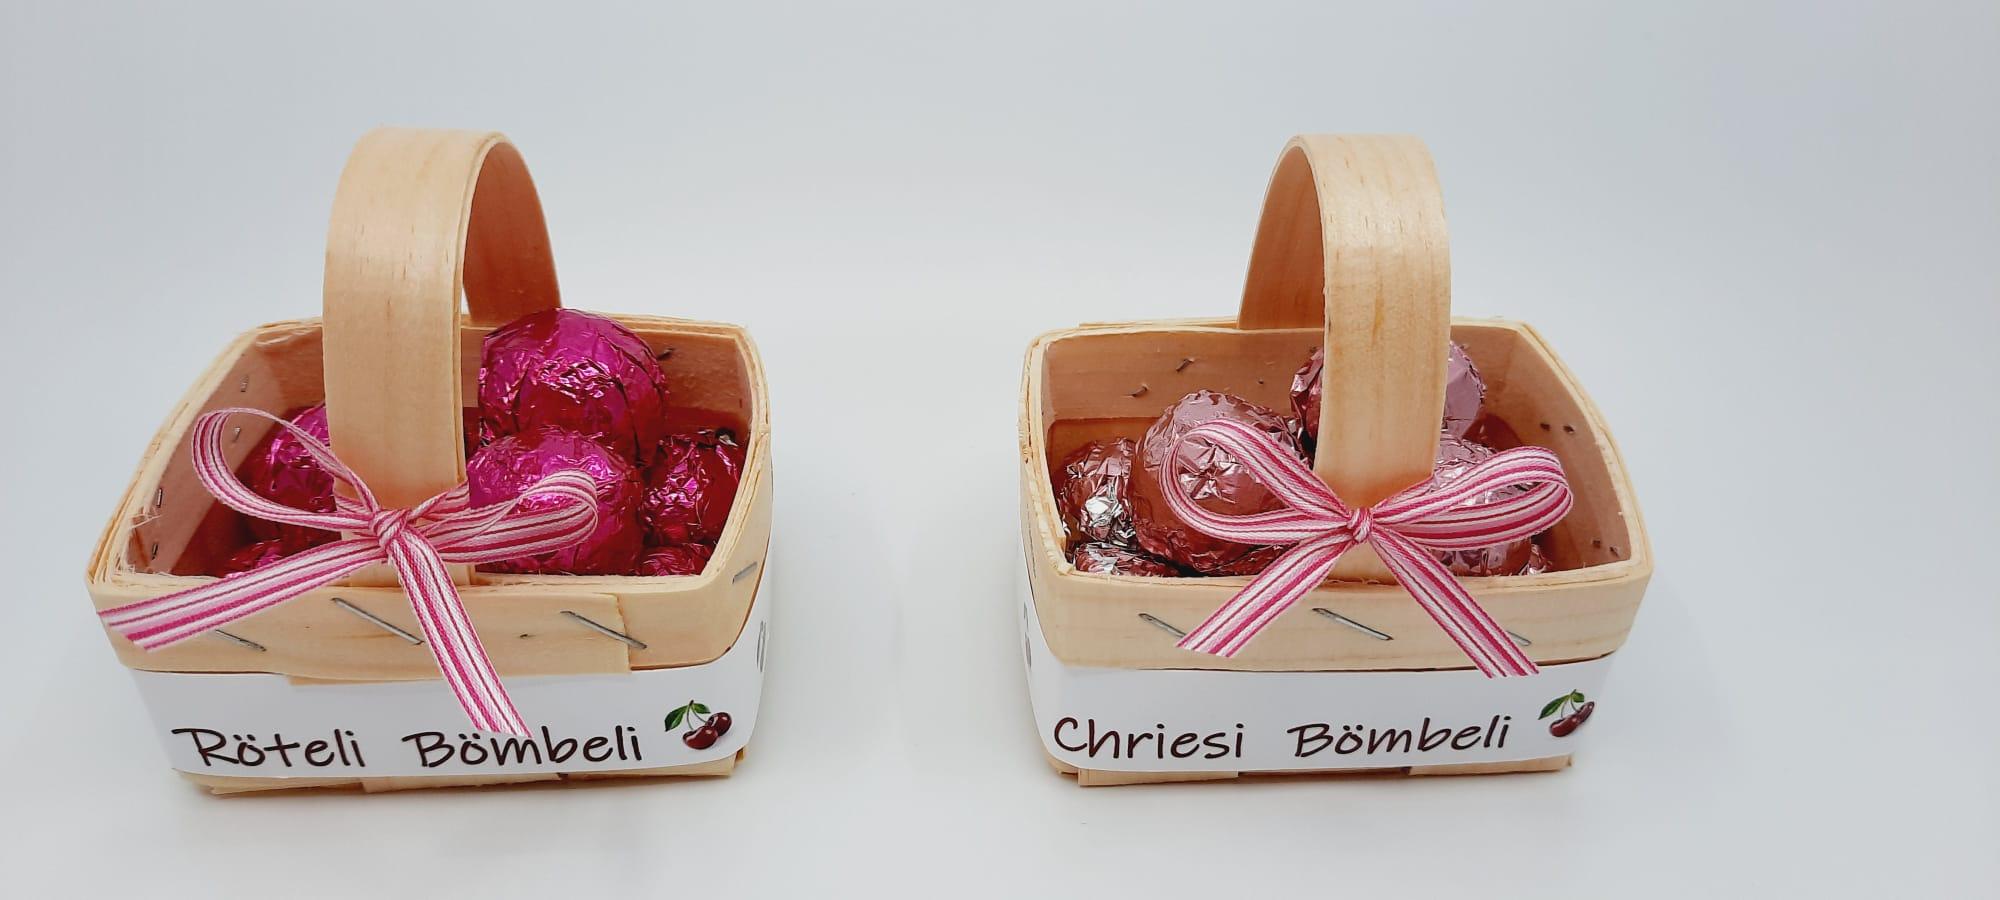 Kirsch und Röteli Bömbeli